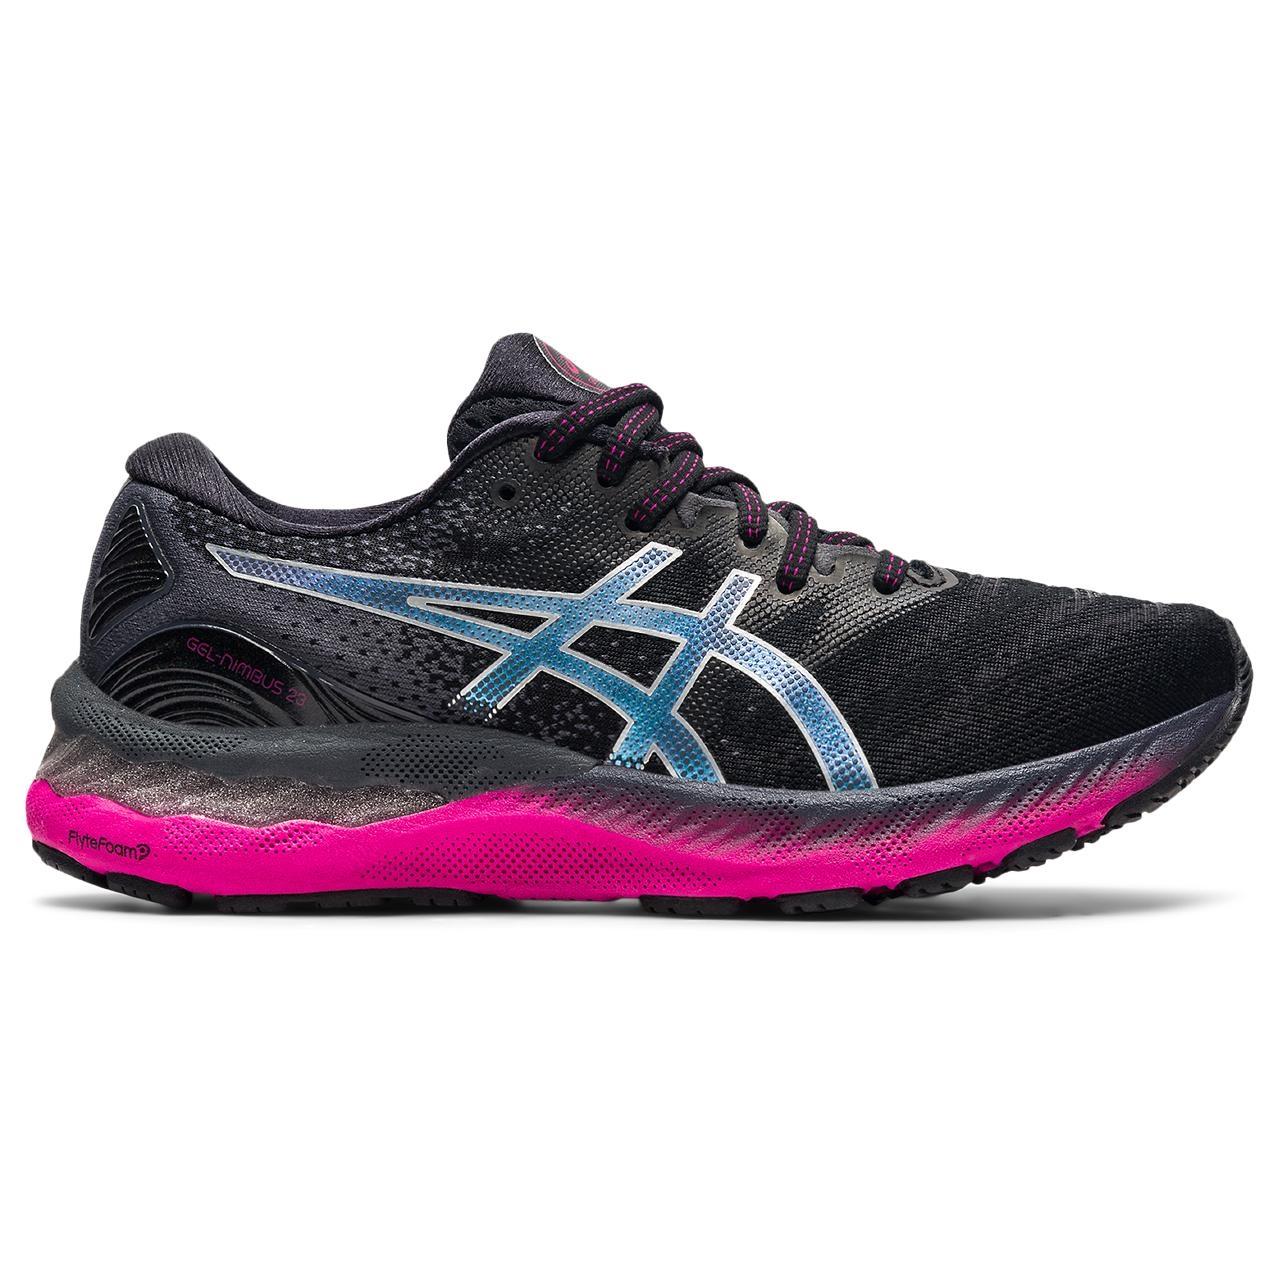 asics GEL-Nimbus 23 Zapatillas Running Mujer - black/pure silver